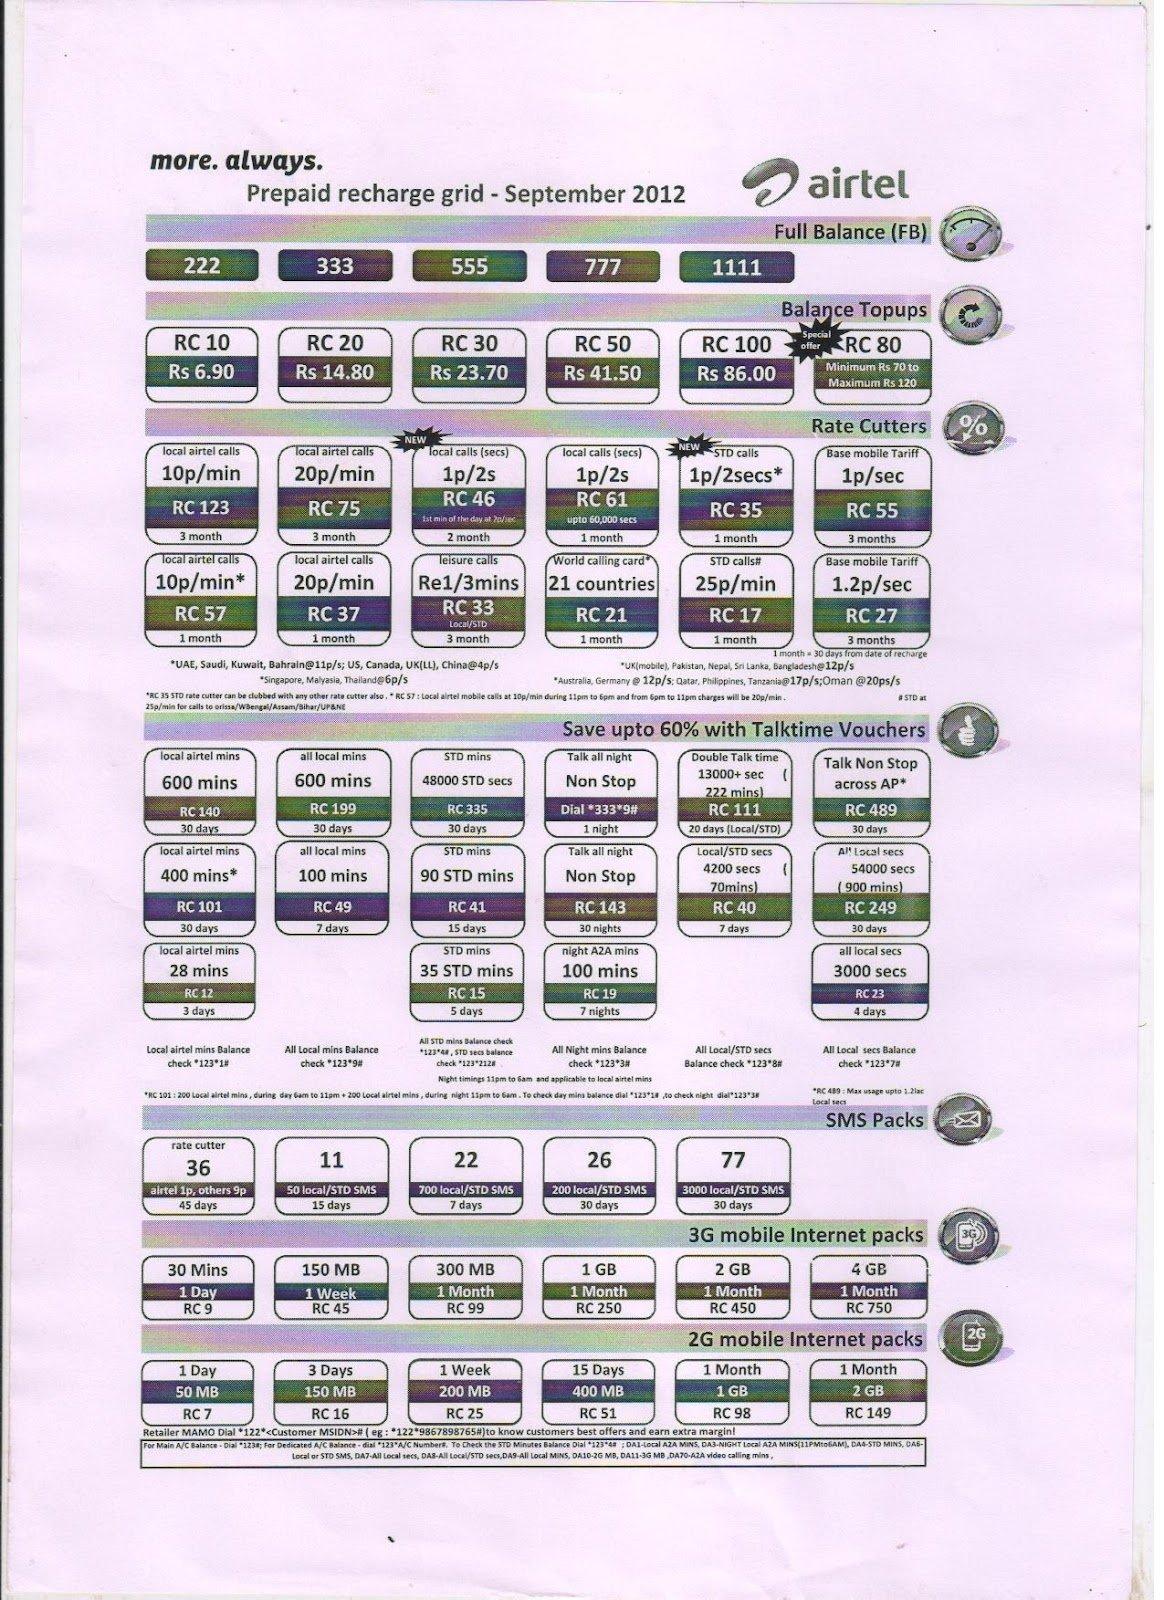 10 Stunning Idea Online Recharge Andhra Pradesh airtel recharge tariff andhra pradesh 2012 world social news